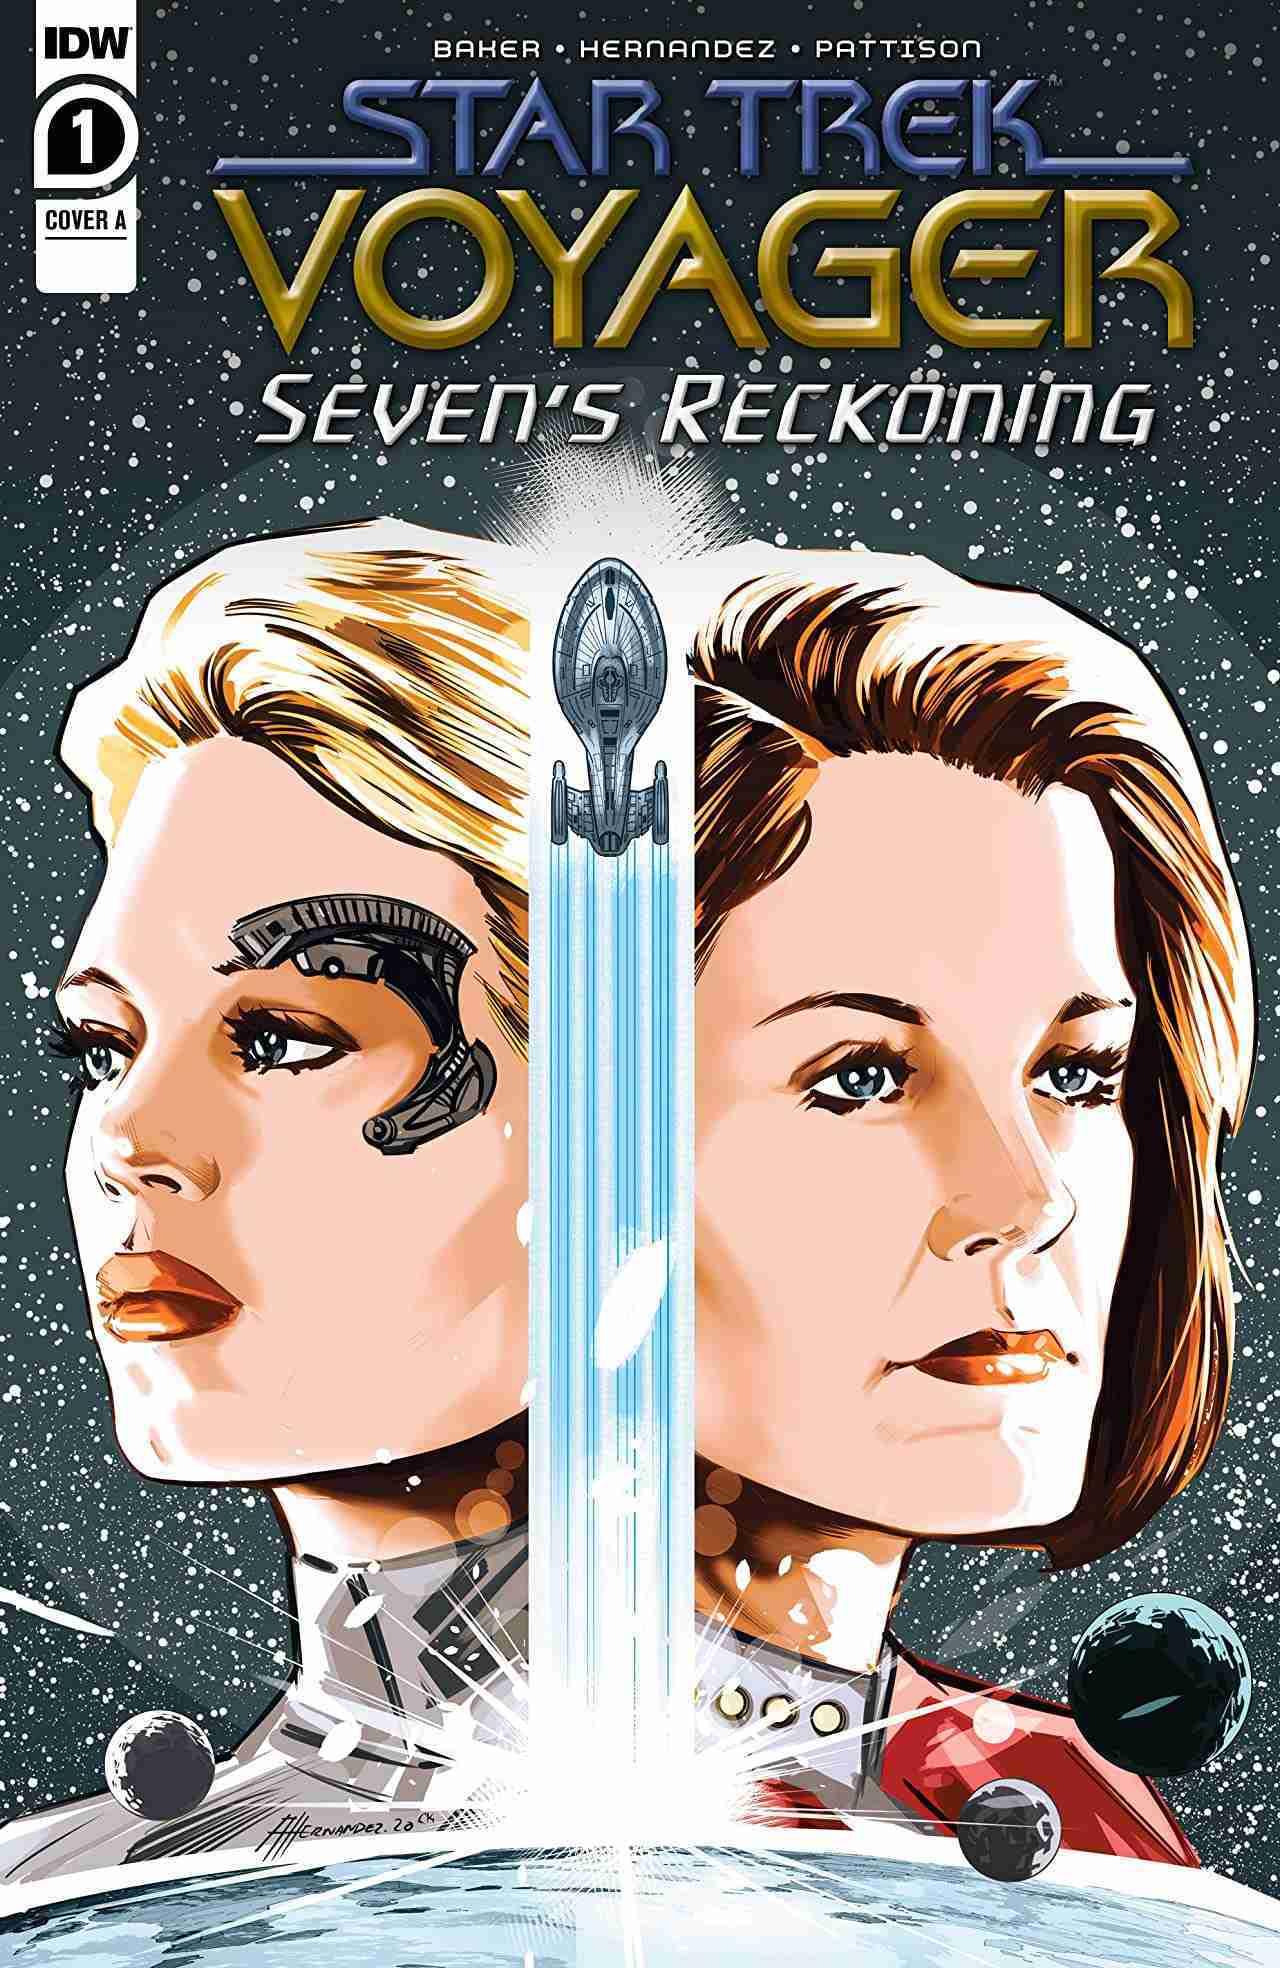 Star Trek Voyager—Seven's Reckoning #1